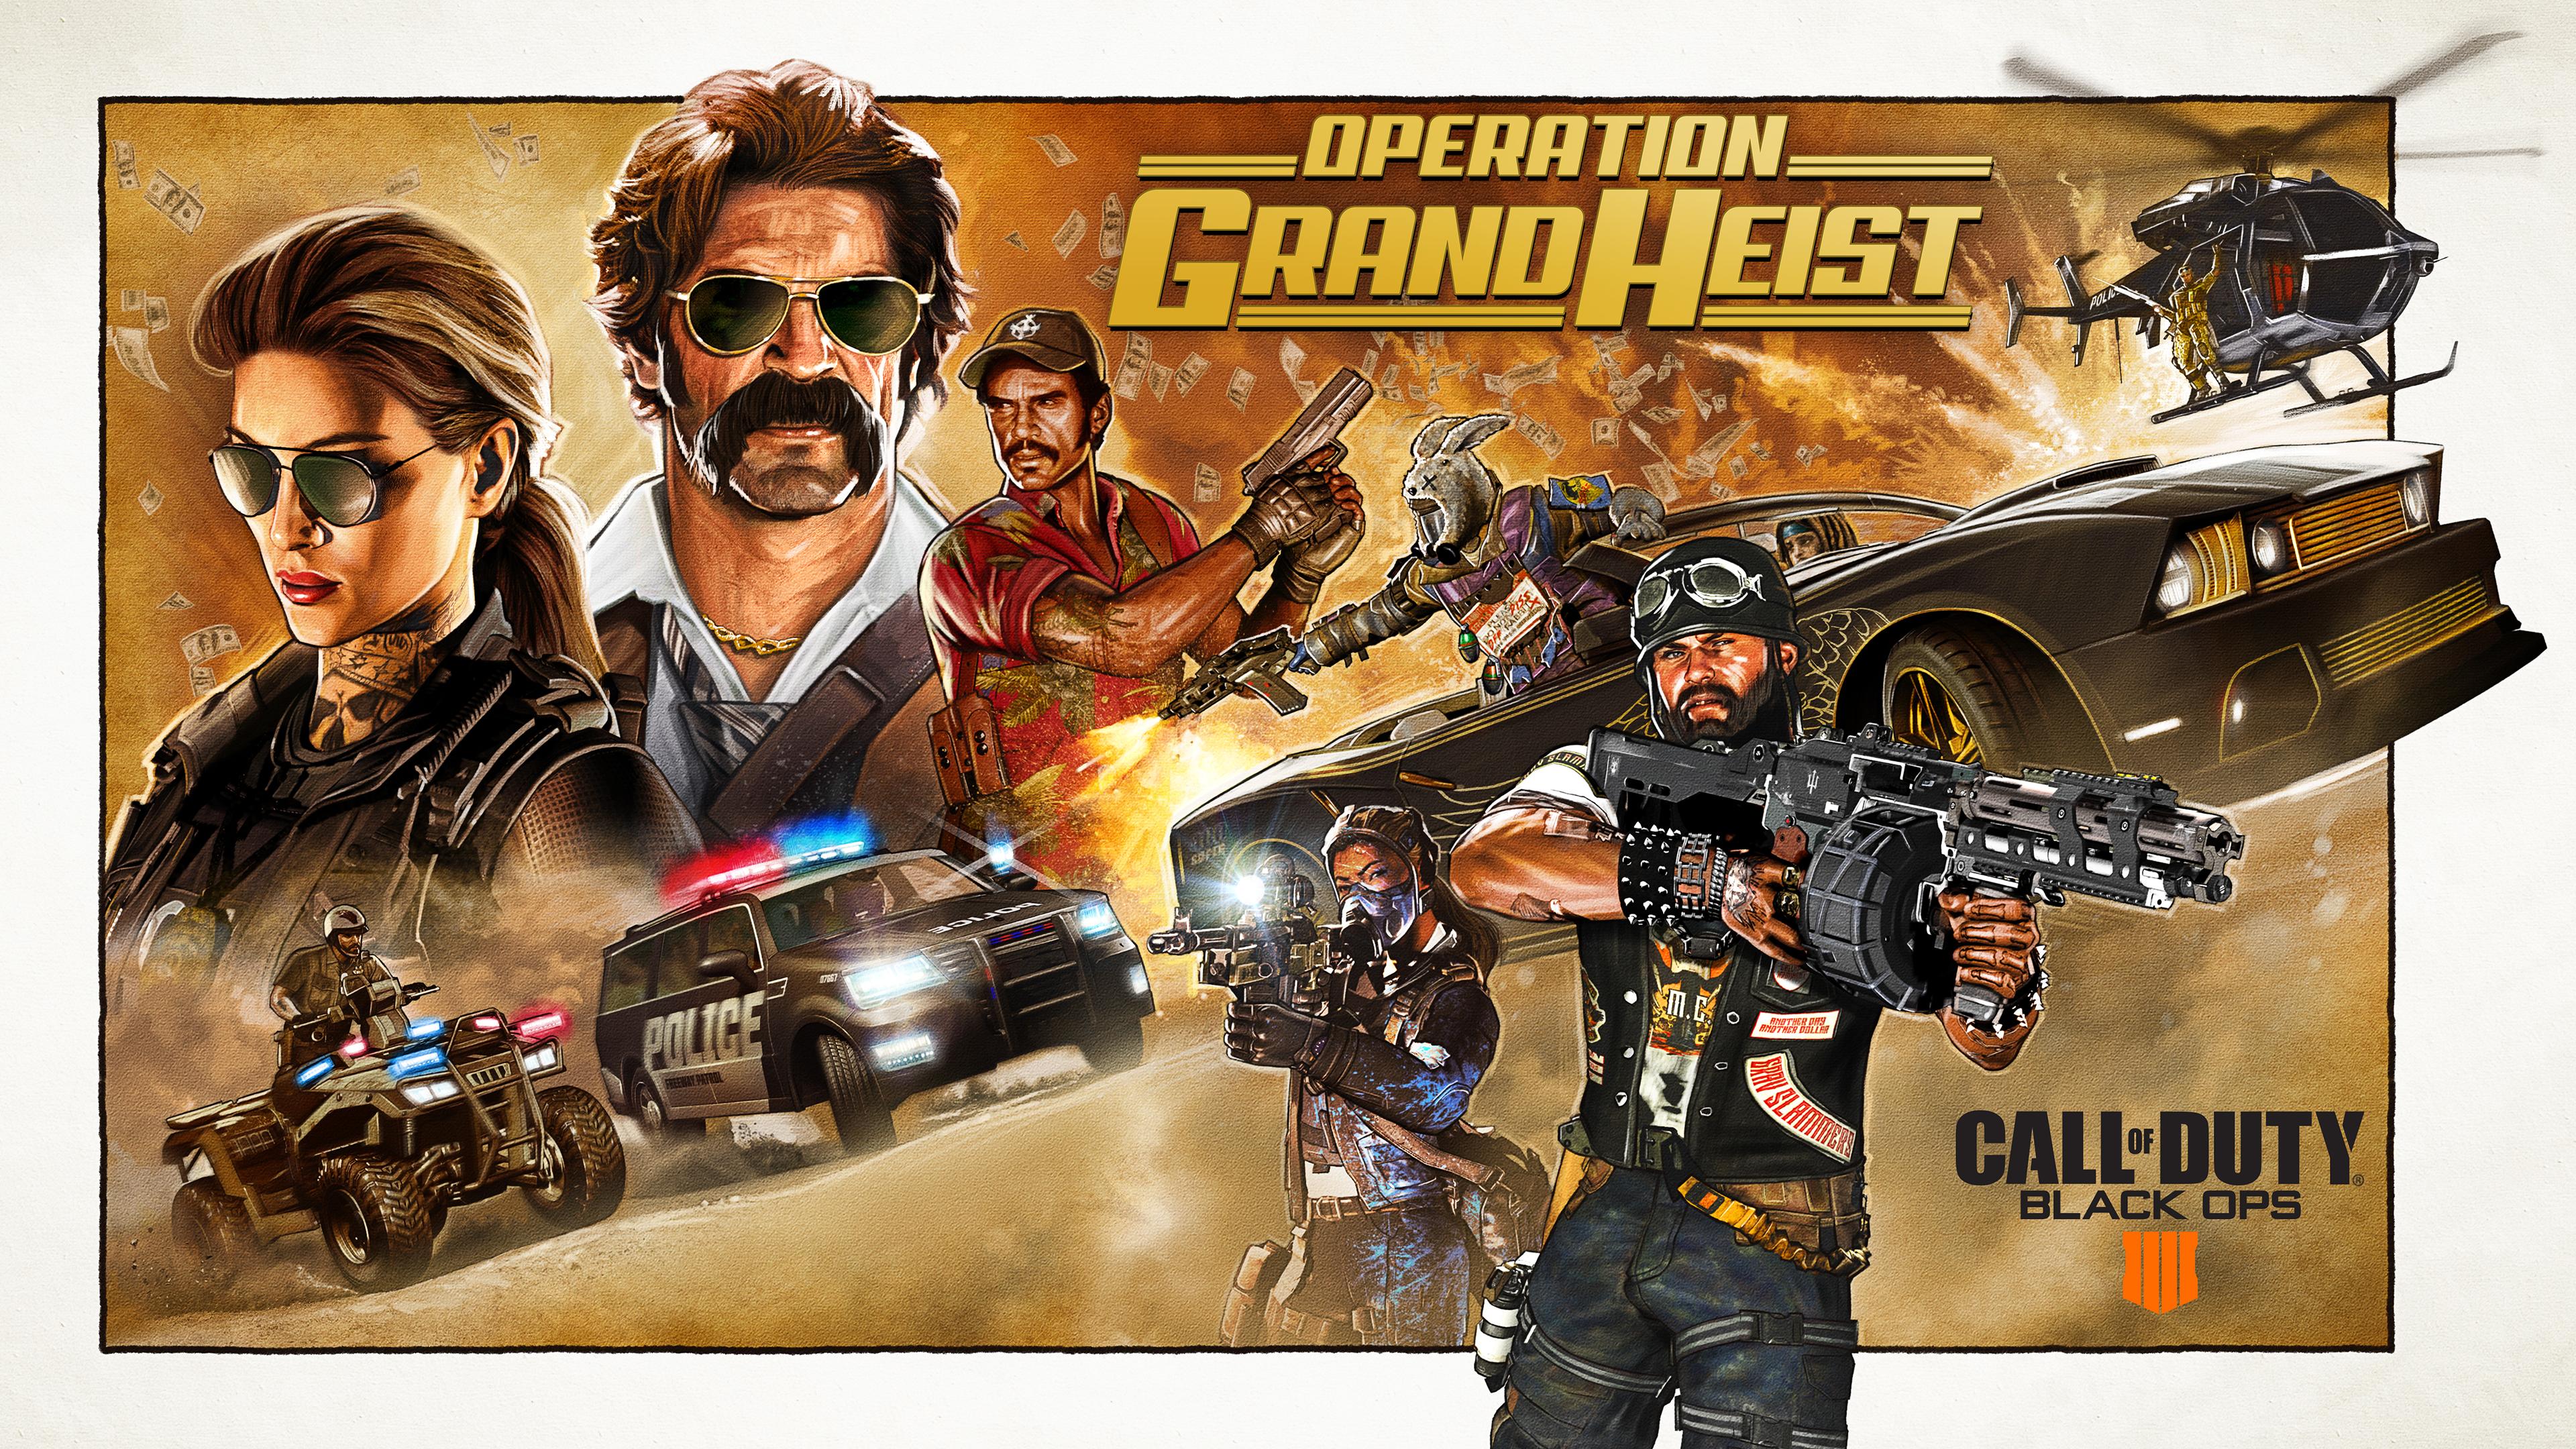 Operation Grand Heist Arrives February 19 on PS4